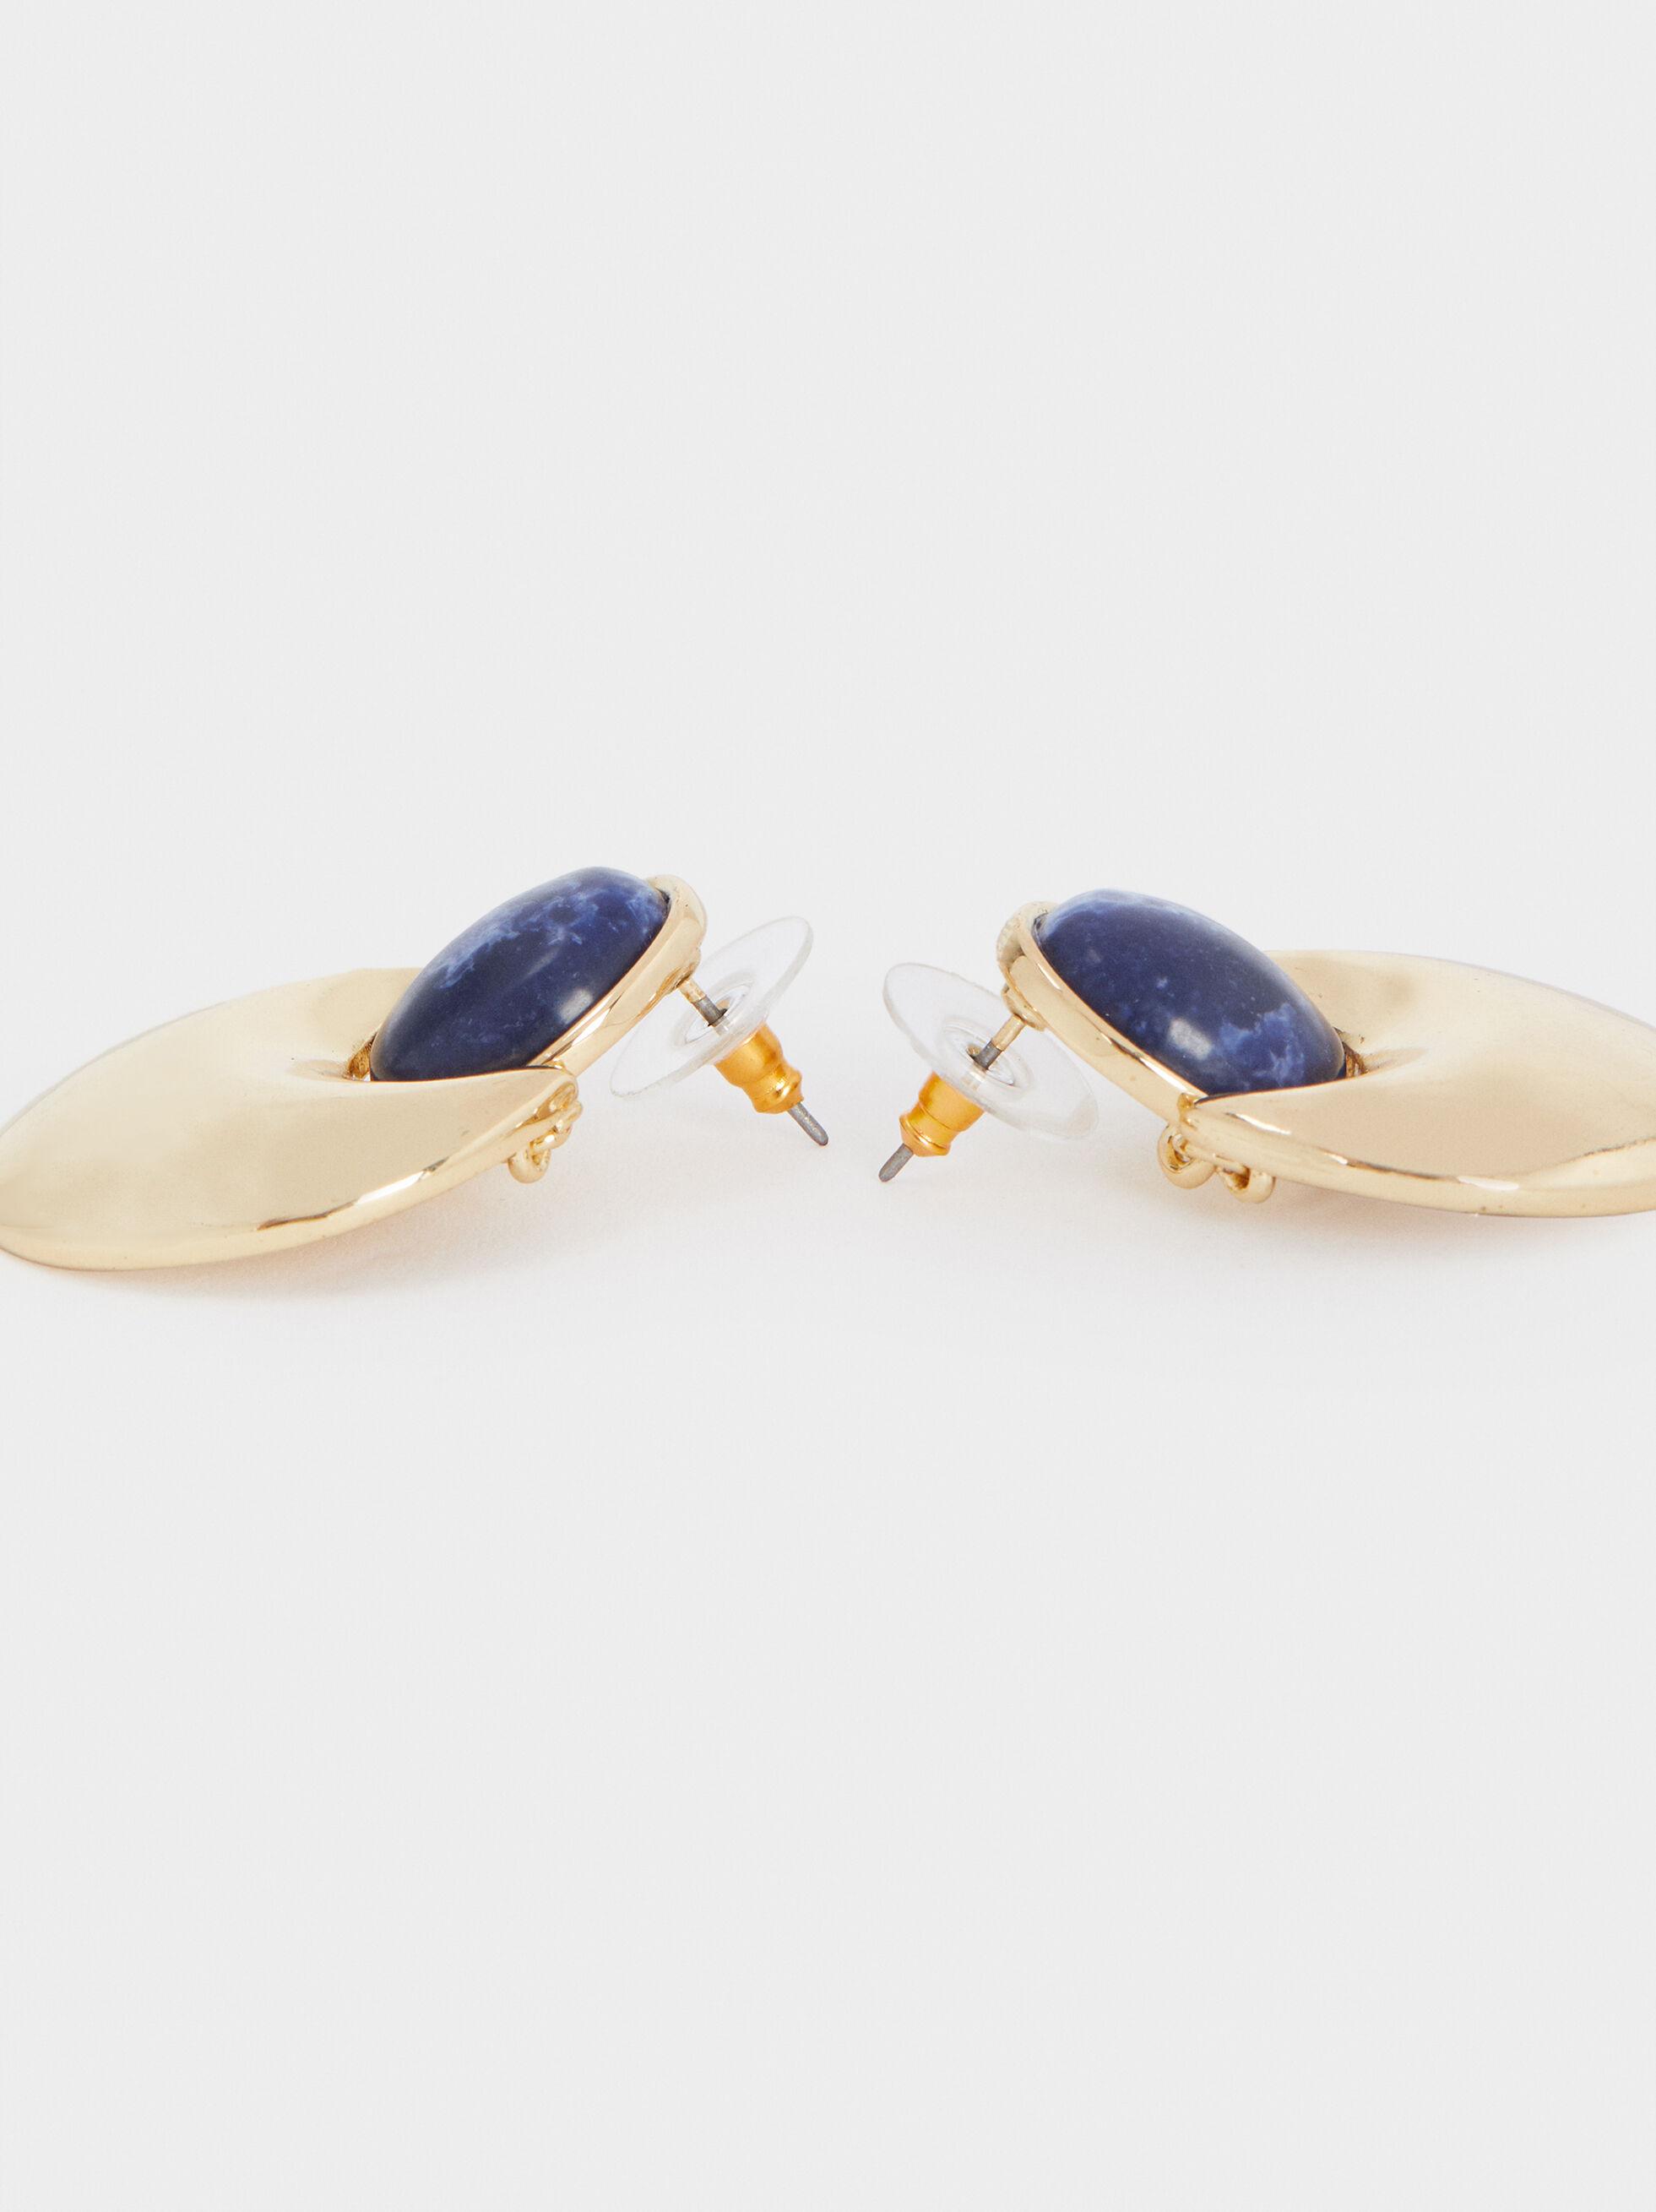 Medium Gold Earrings With Gems, Grey, hi-res